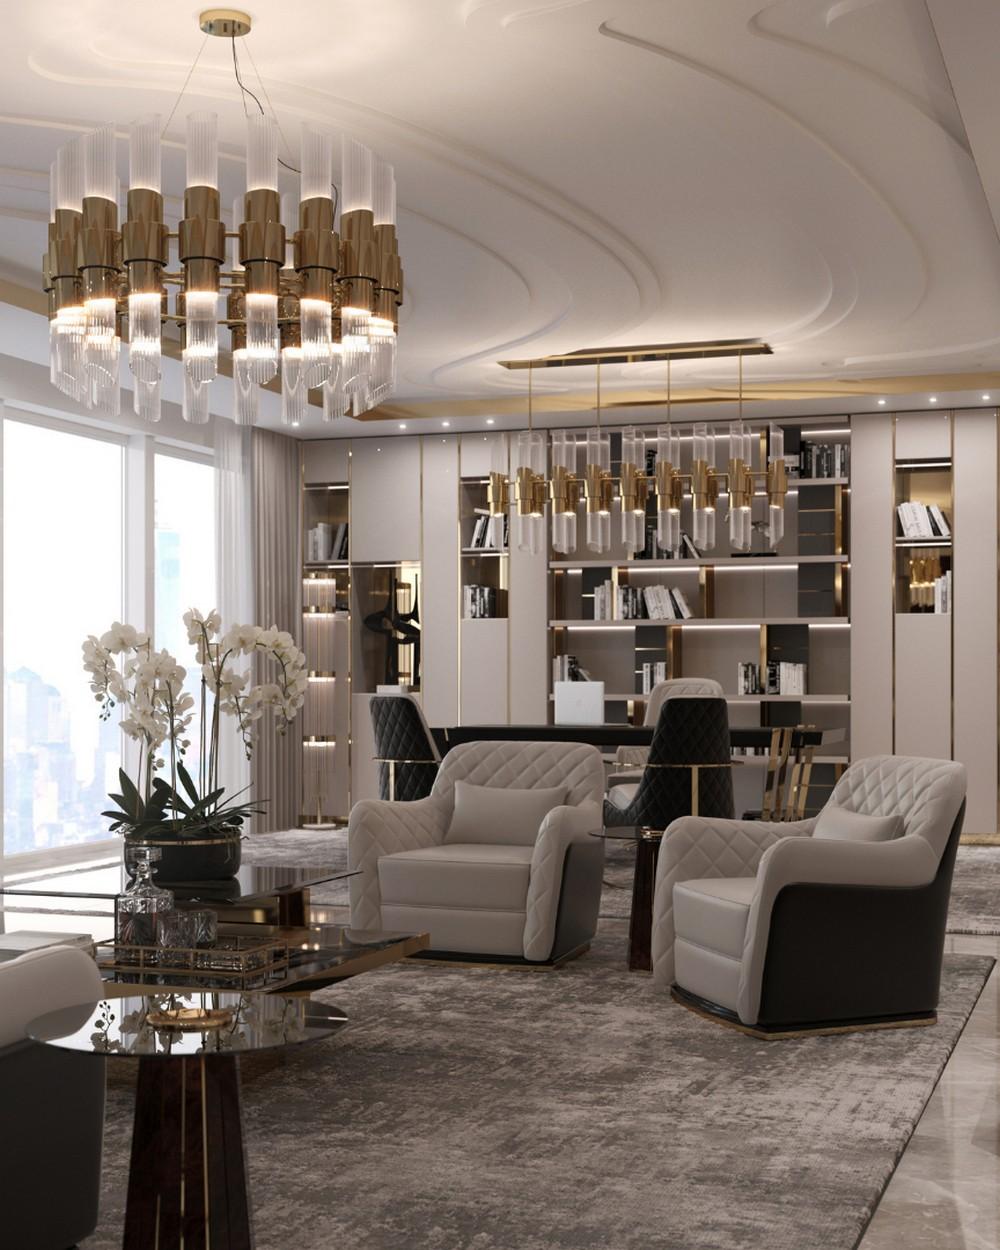 living room ideas 18 Living Room Ideas And Essentials – PART III 7 7